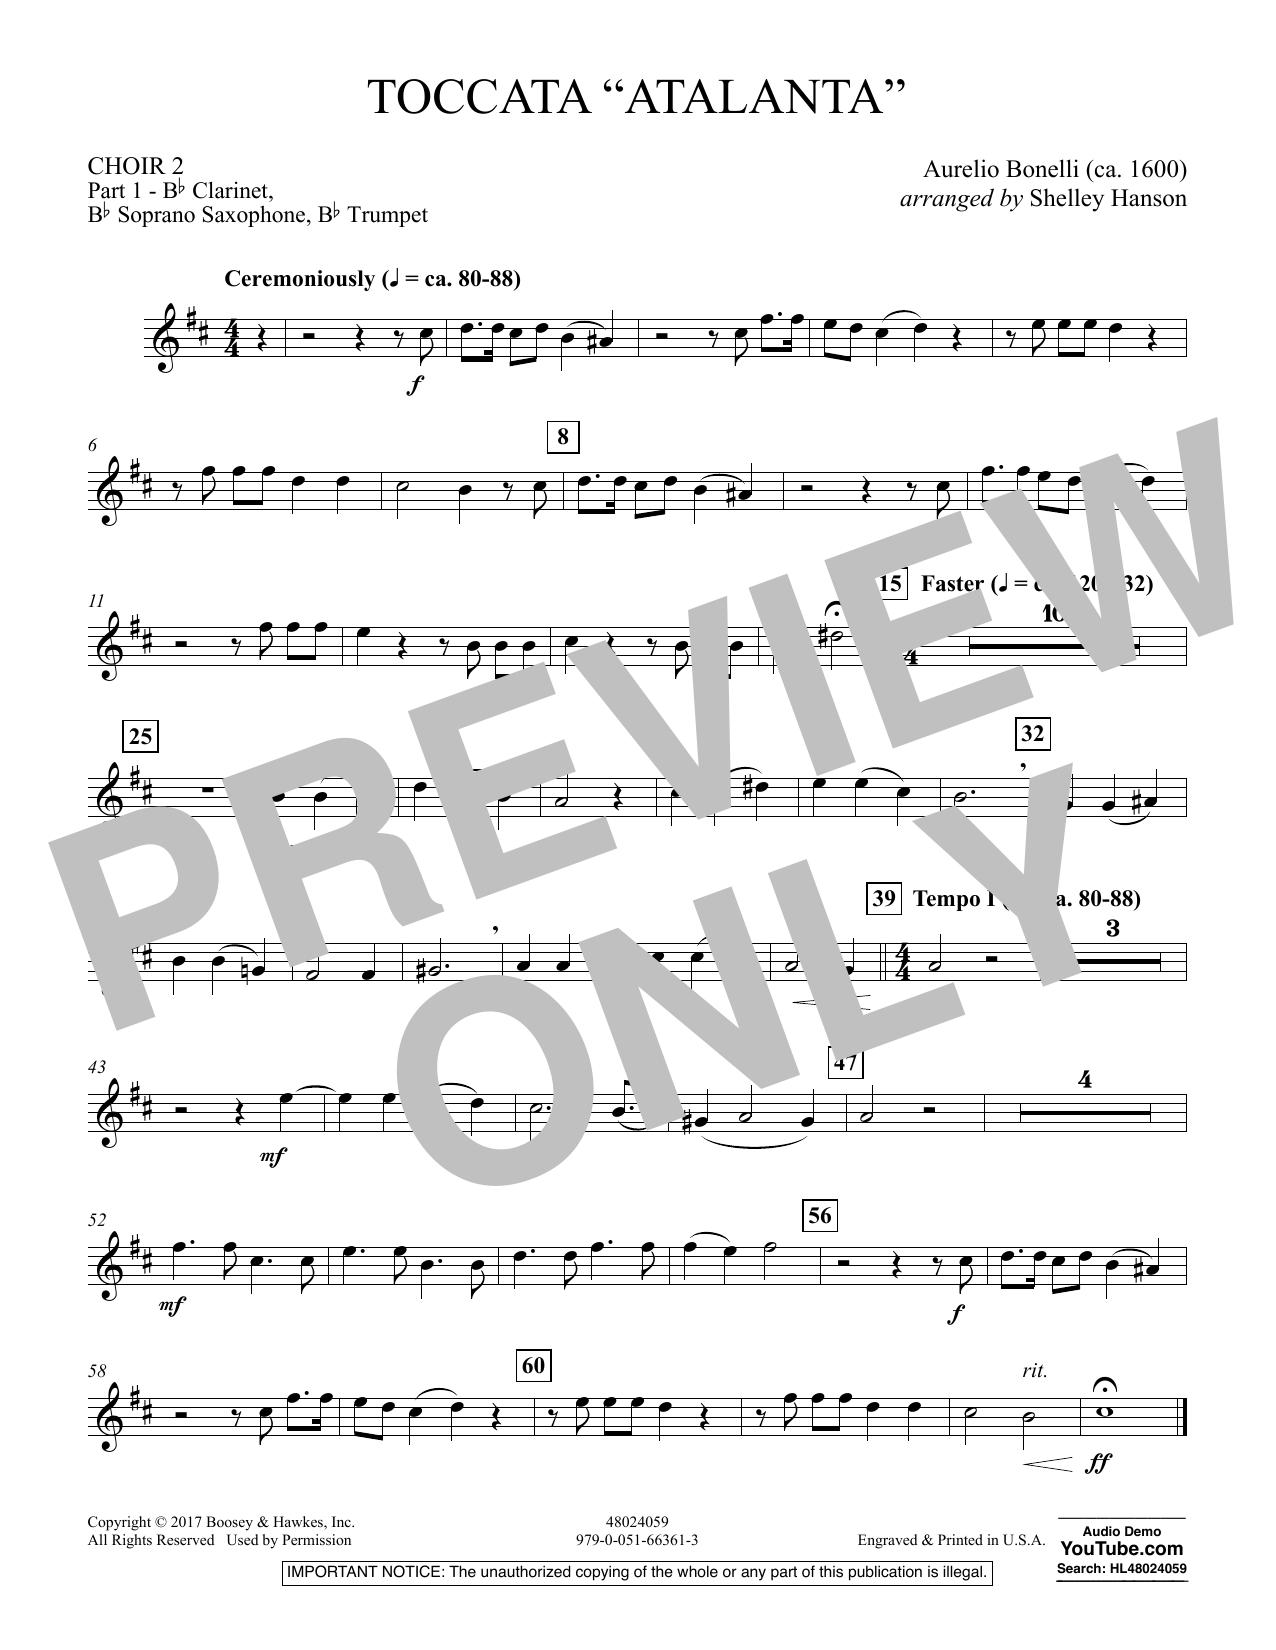 "Toccata (""Atalanta"") - Choir 2-Pt 1-Clar,Sop Sx,Tpt (Concert Band)"